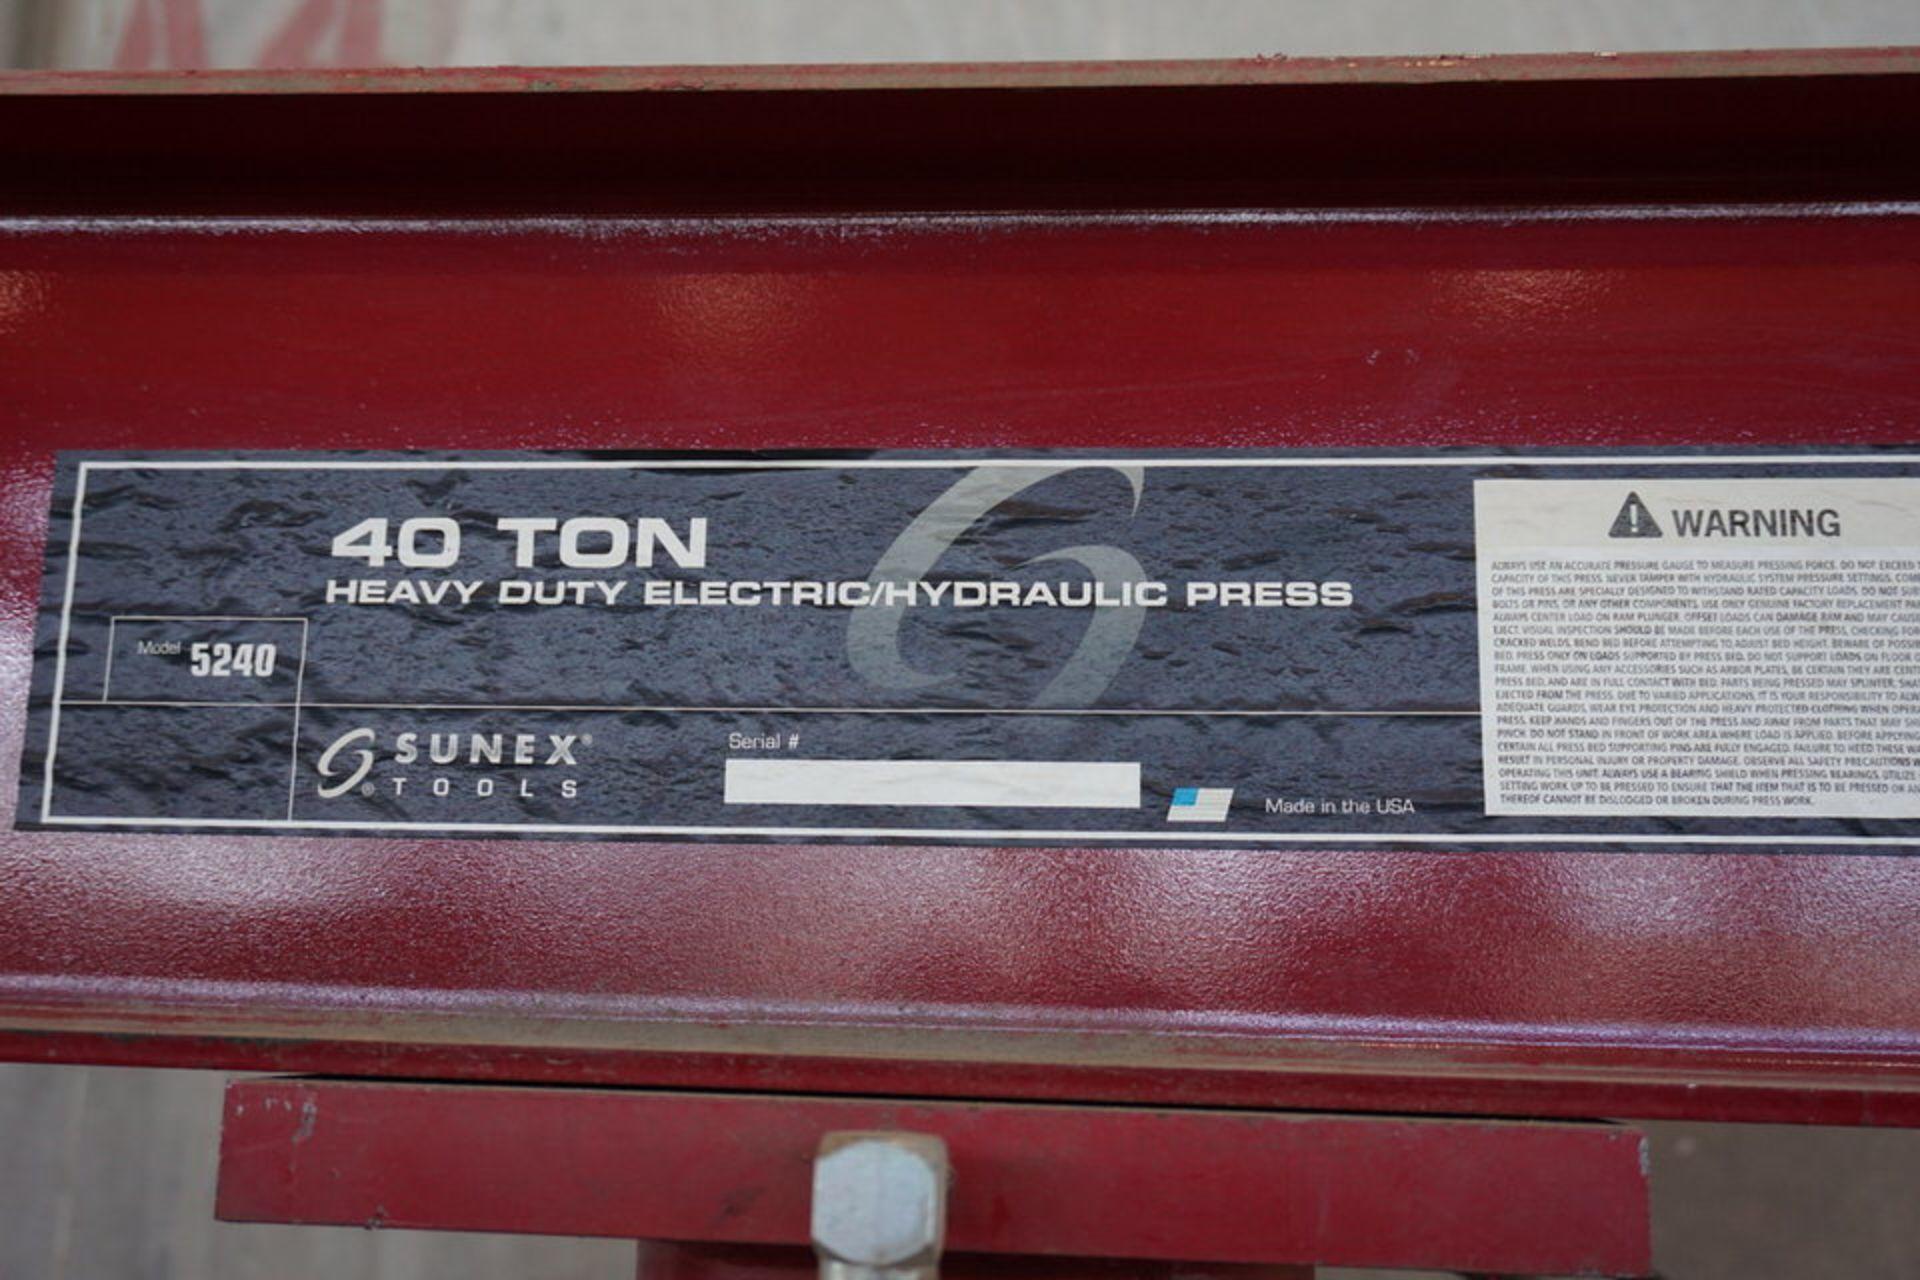 Lot 36 - SUNEX 40 TON ELEC/HYDRAULIC PRESS